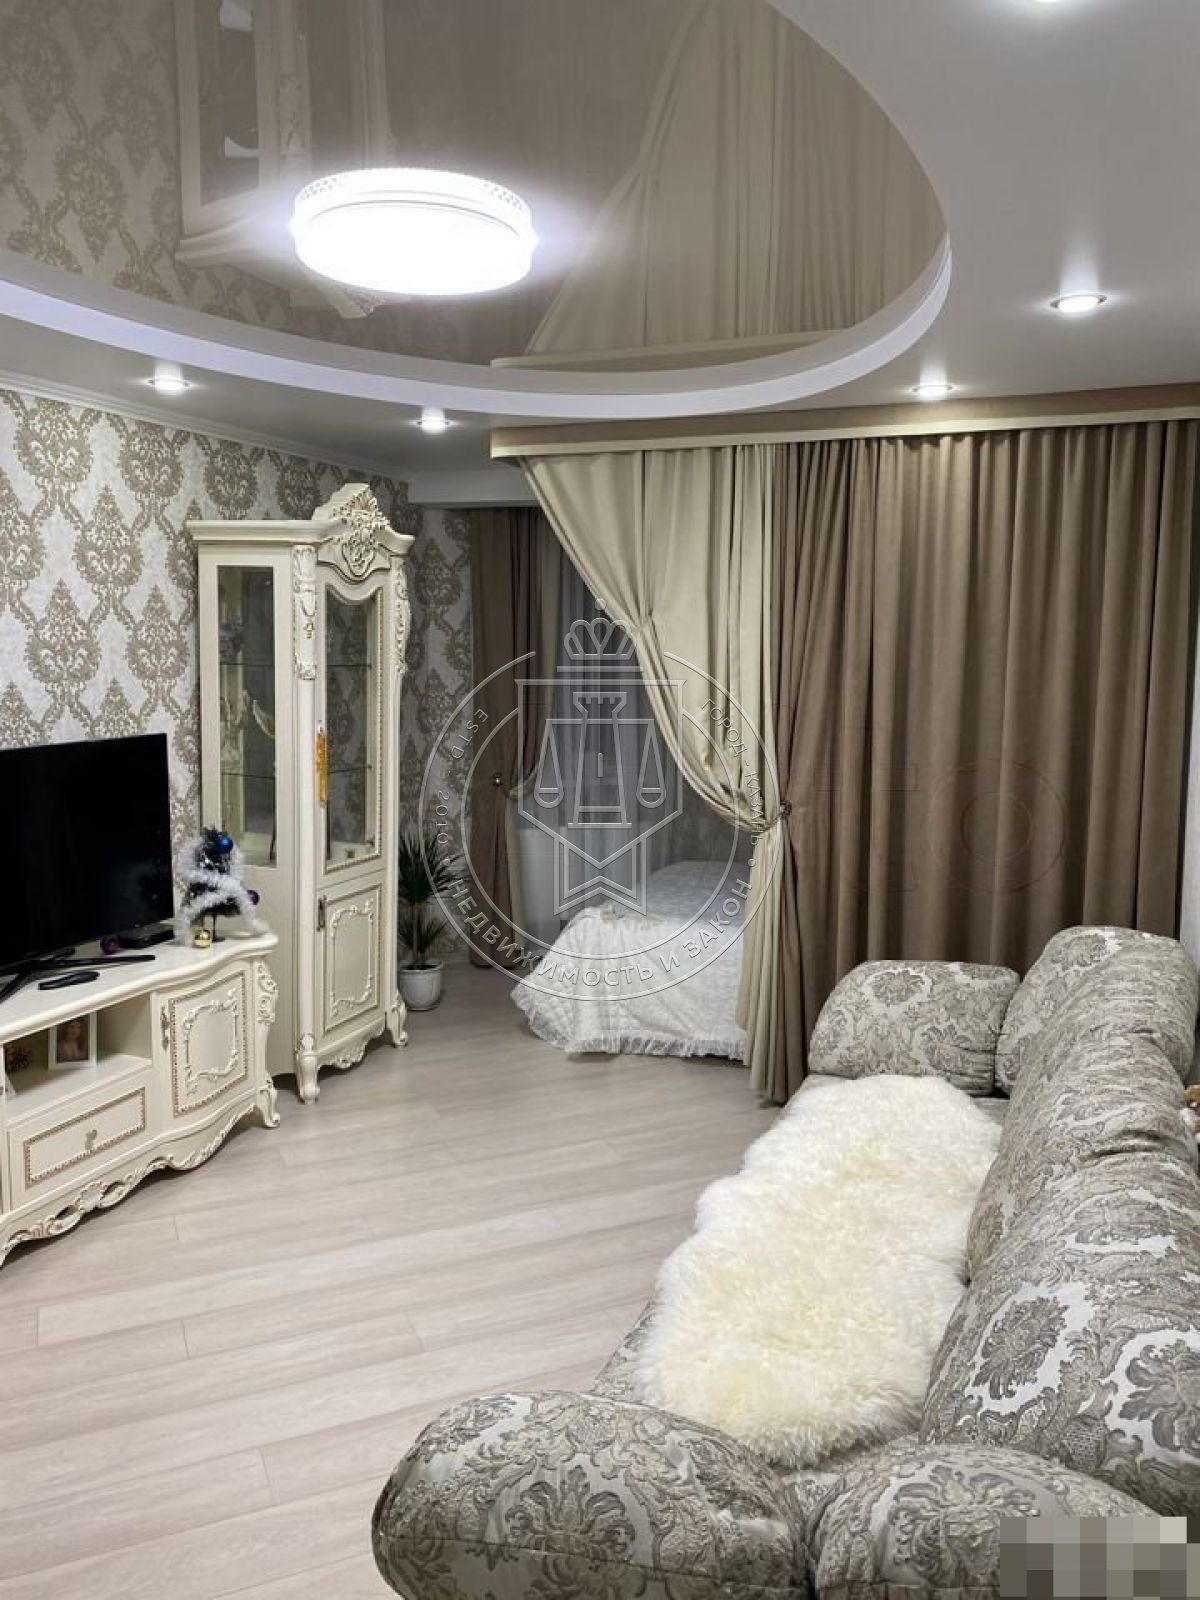 Продажа 1-к квартиры Квартал 7 ул, 9